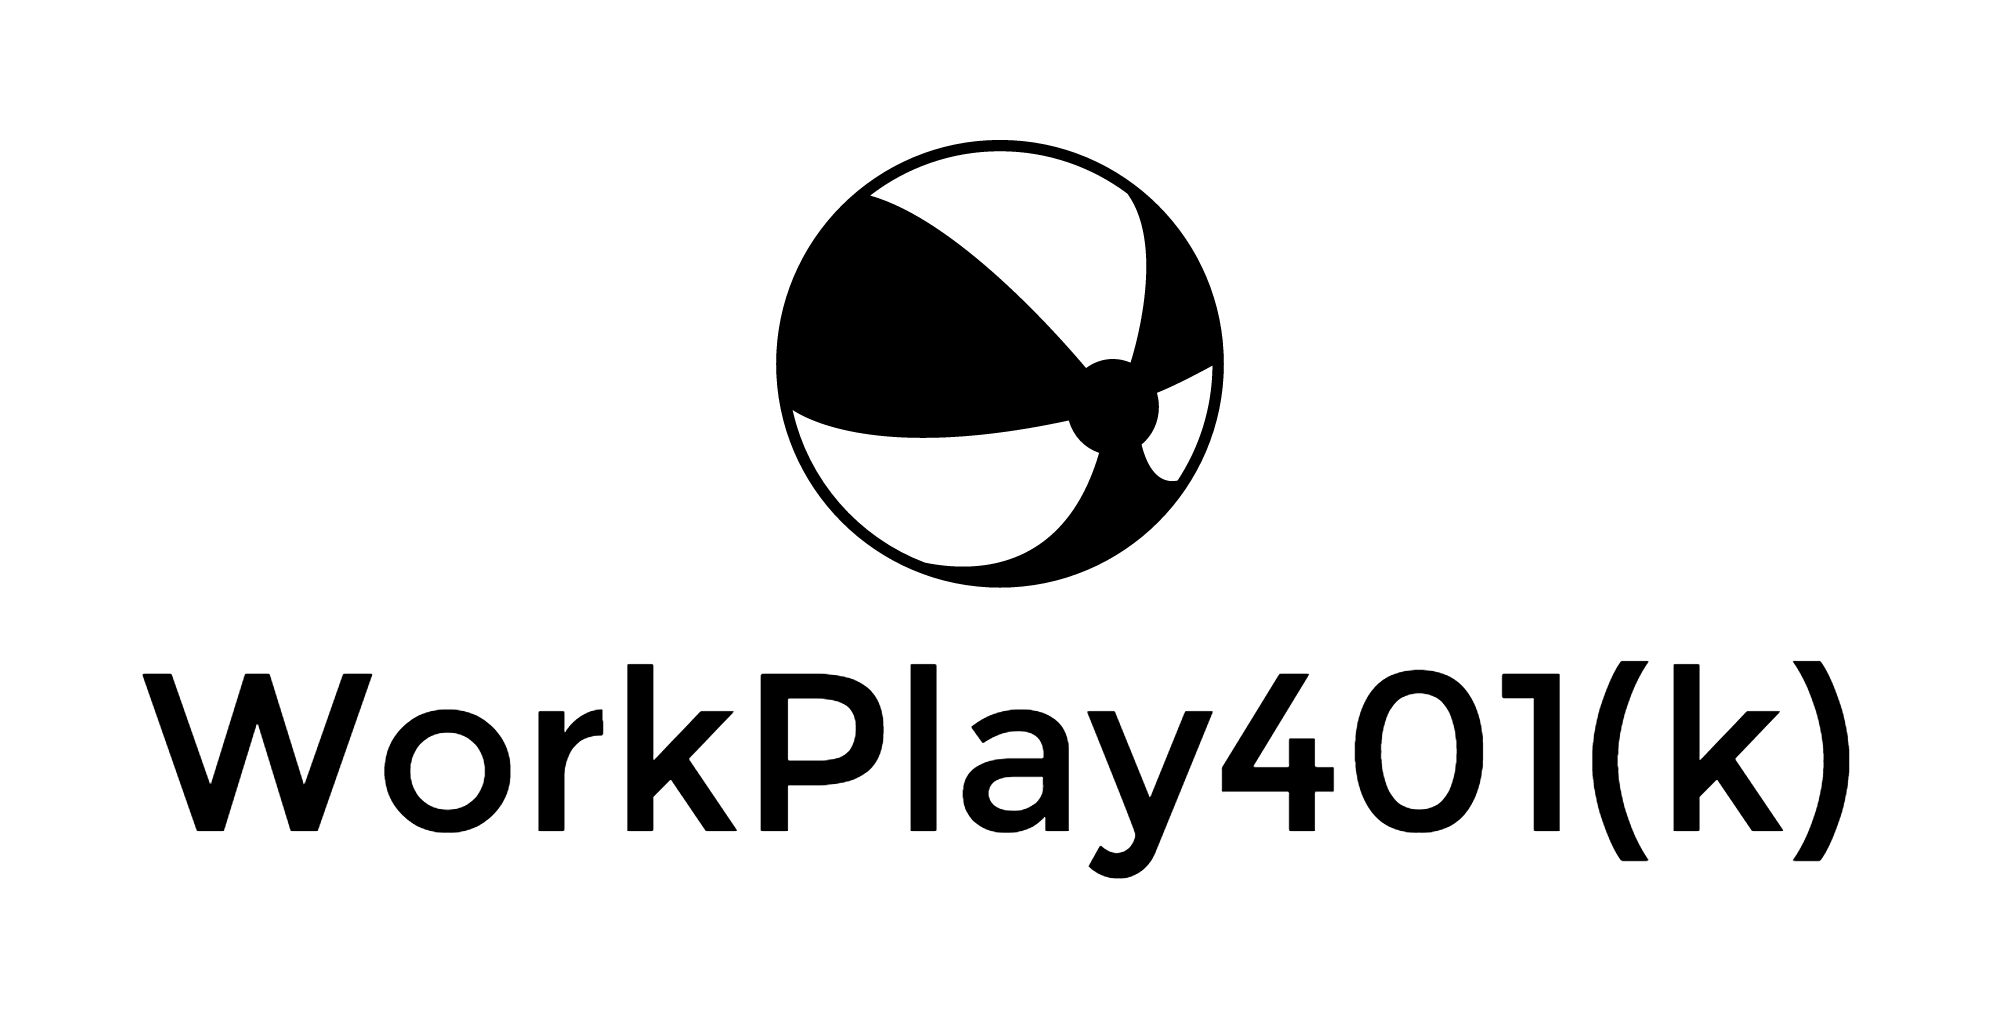 WorkPlay401(k)-logo-black